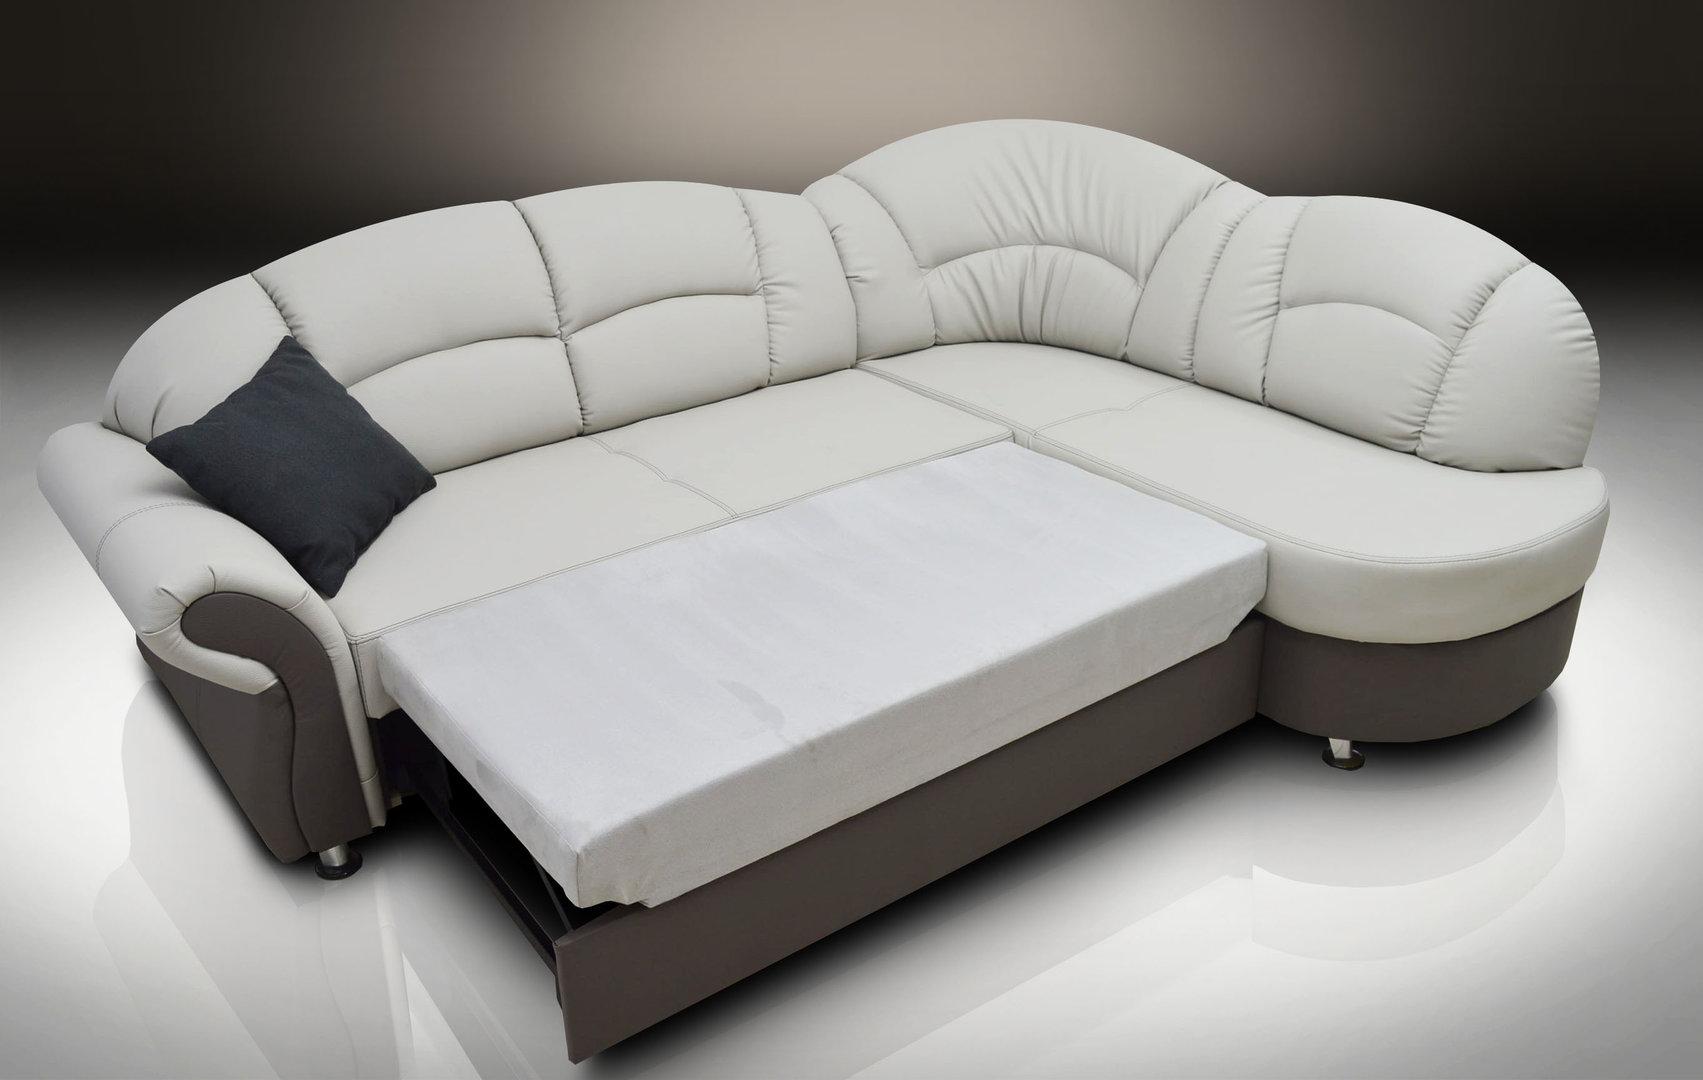 Corner sofa made of bonded leather romero gray / elephant GLVBCBH